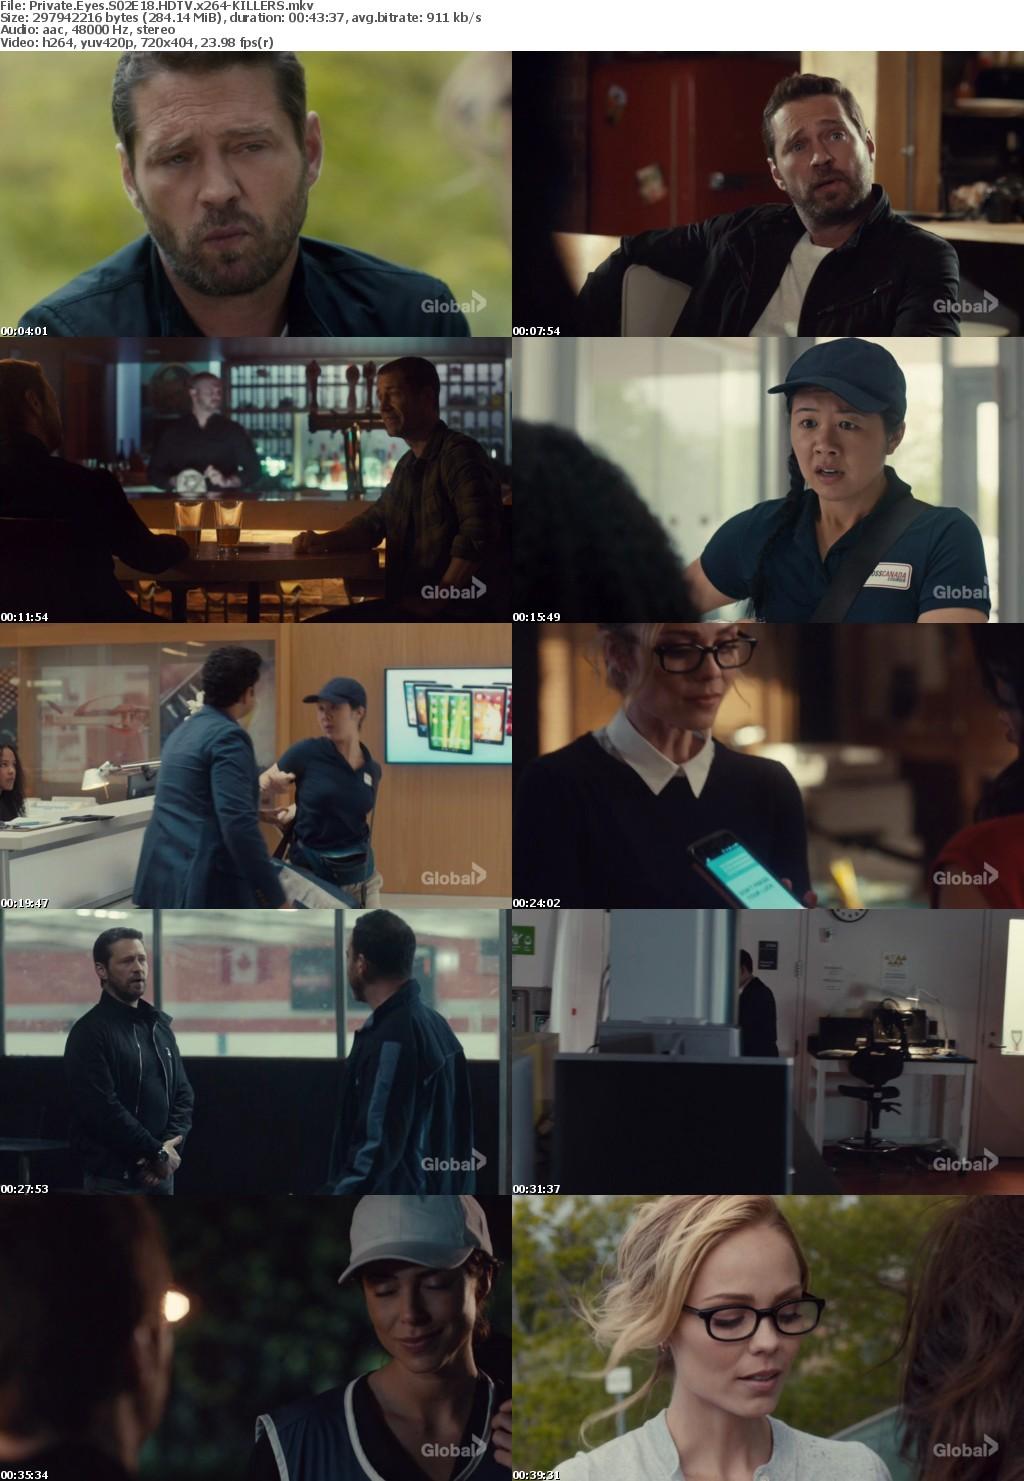 Private Eyes S02E18 HDTV x264-KILLERS